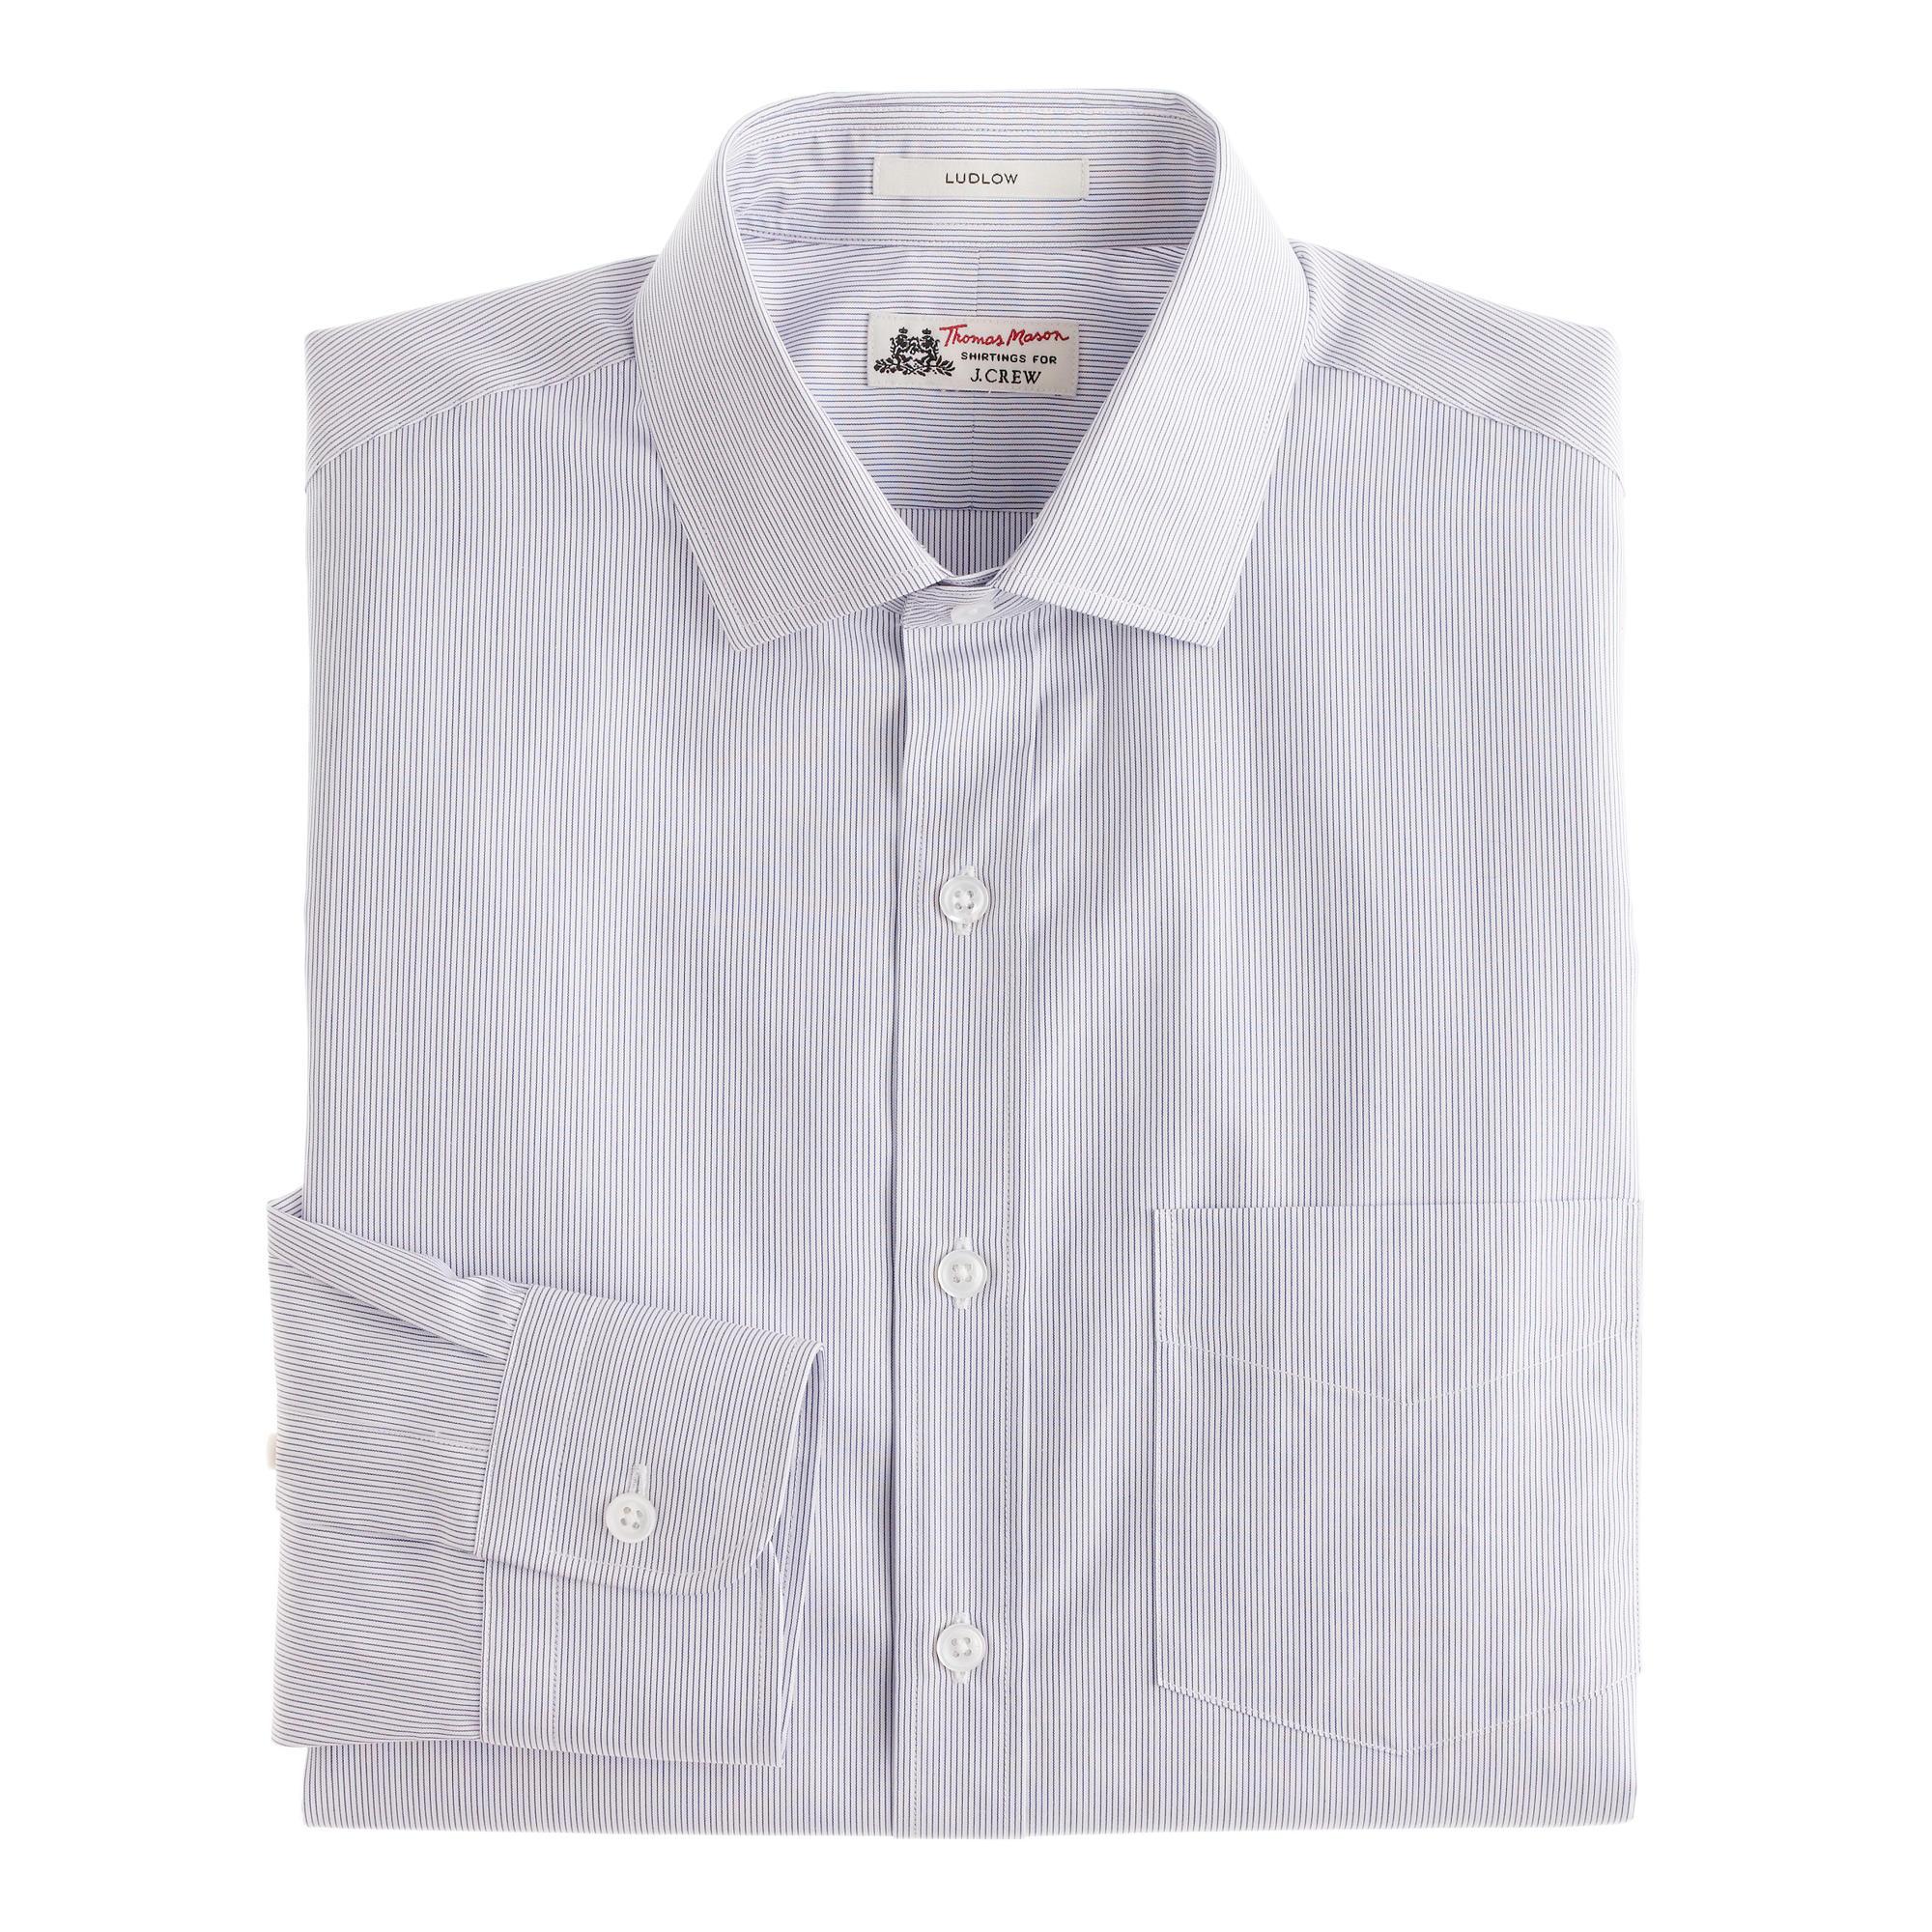 Thomas mason ludlow shirt in paradise blue stripe for Thomas mason dress shirts